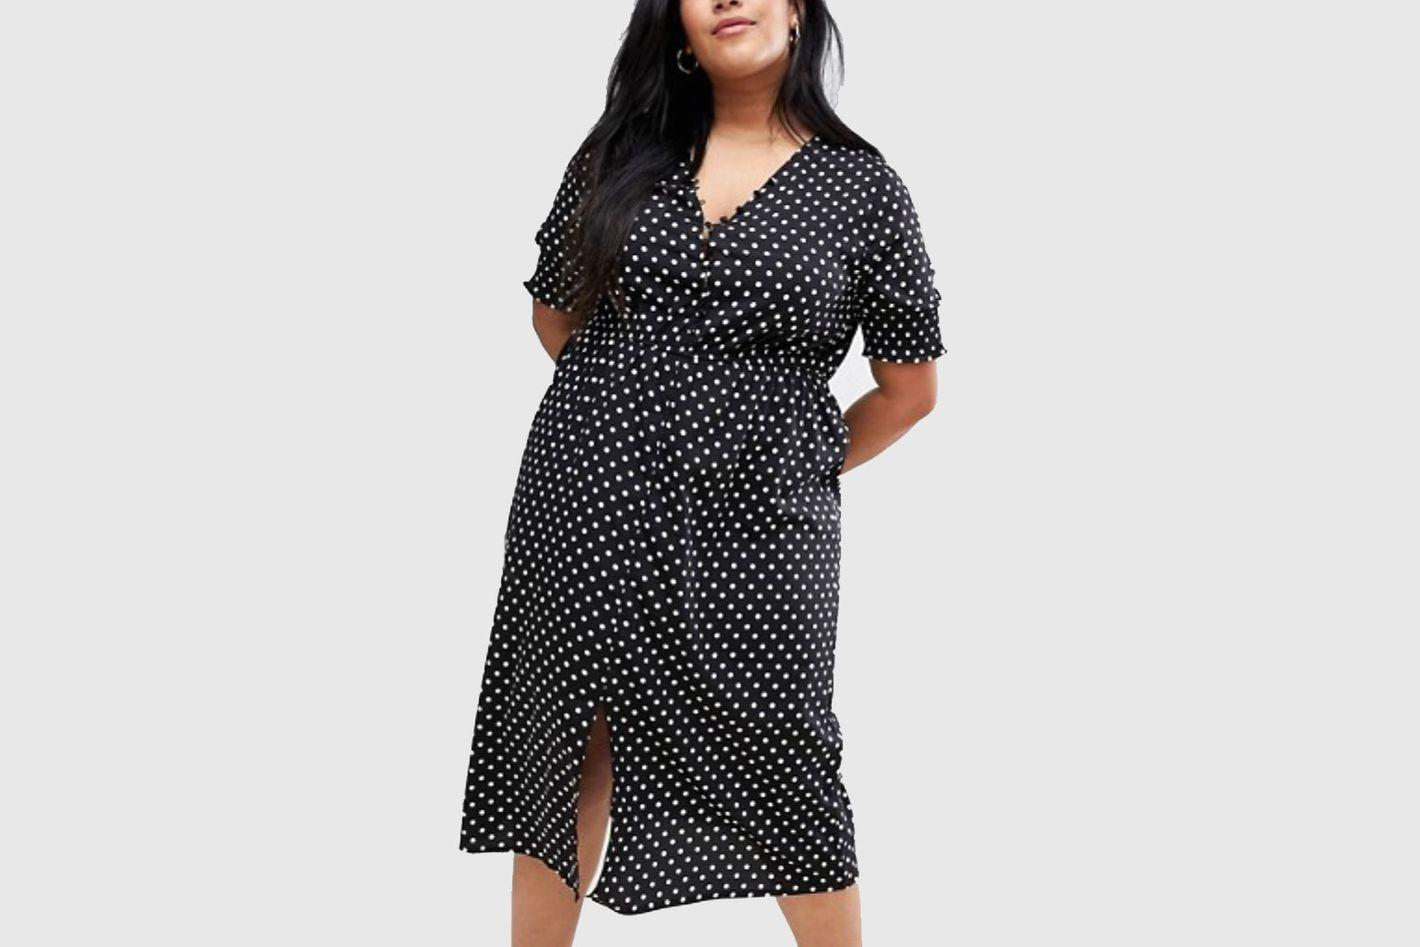 882ac1251490 11 Polka Dot Dresses